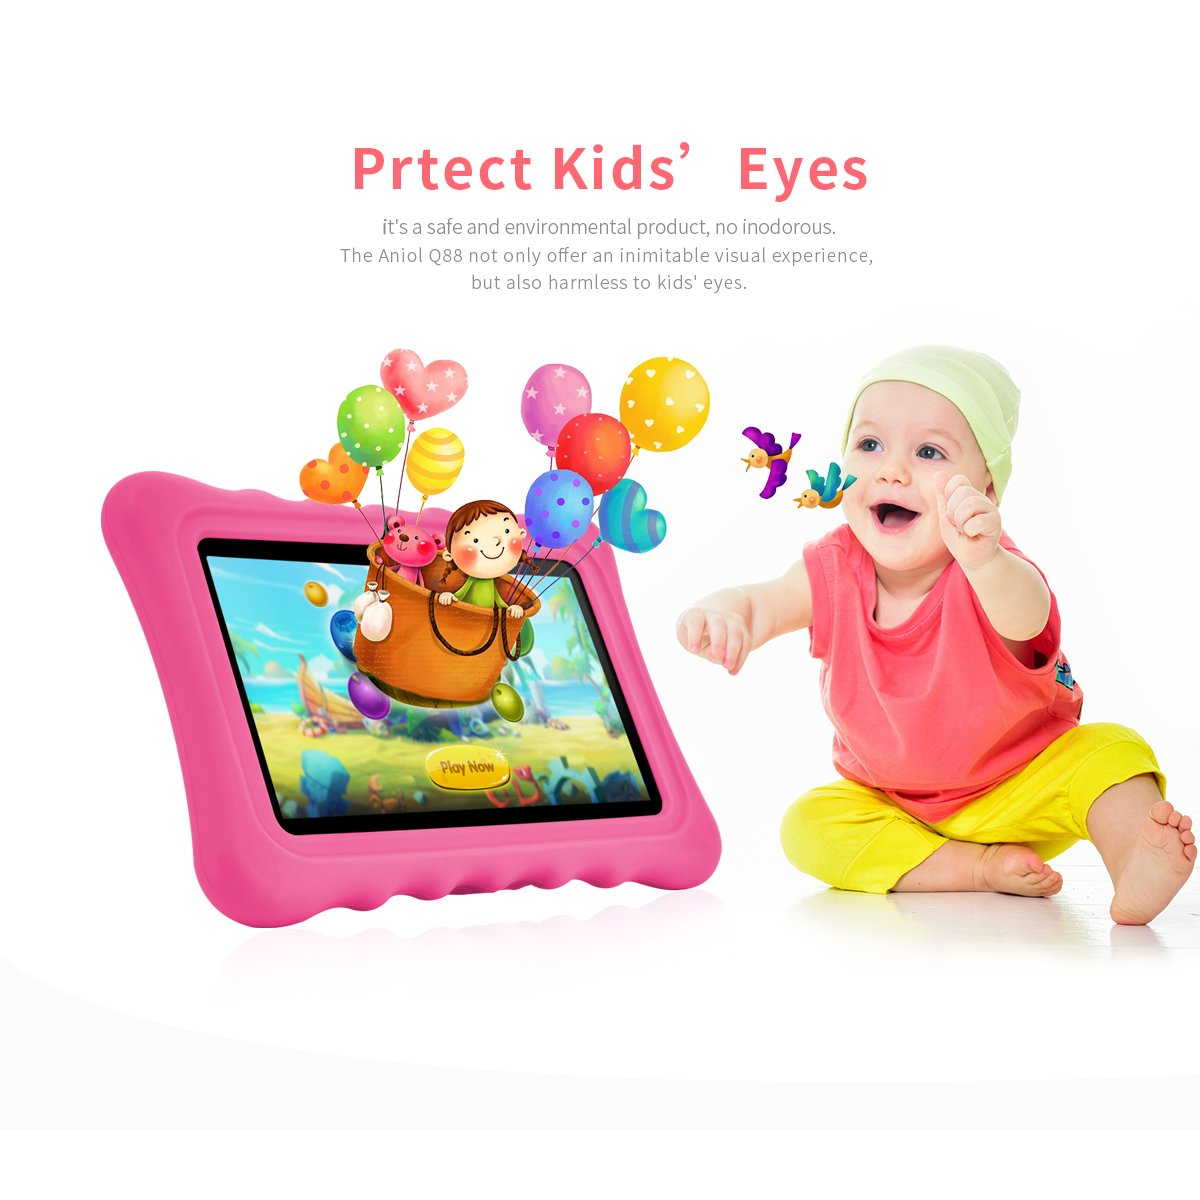 Ainol Q88 Android 7.1 RK3126C Quad Core 1GB+16GB 0.3MP+0.3MP Cam WiFi 2800Ah Tablet PC--Pink by Ainol Q88 (Image #2)